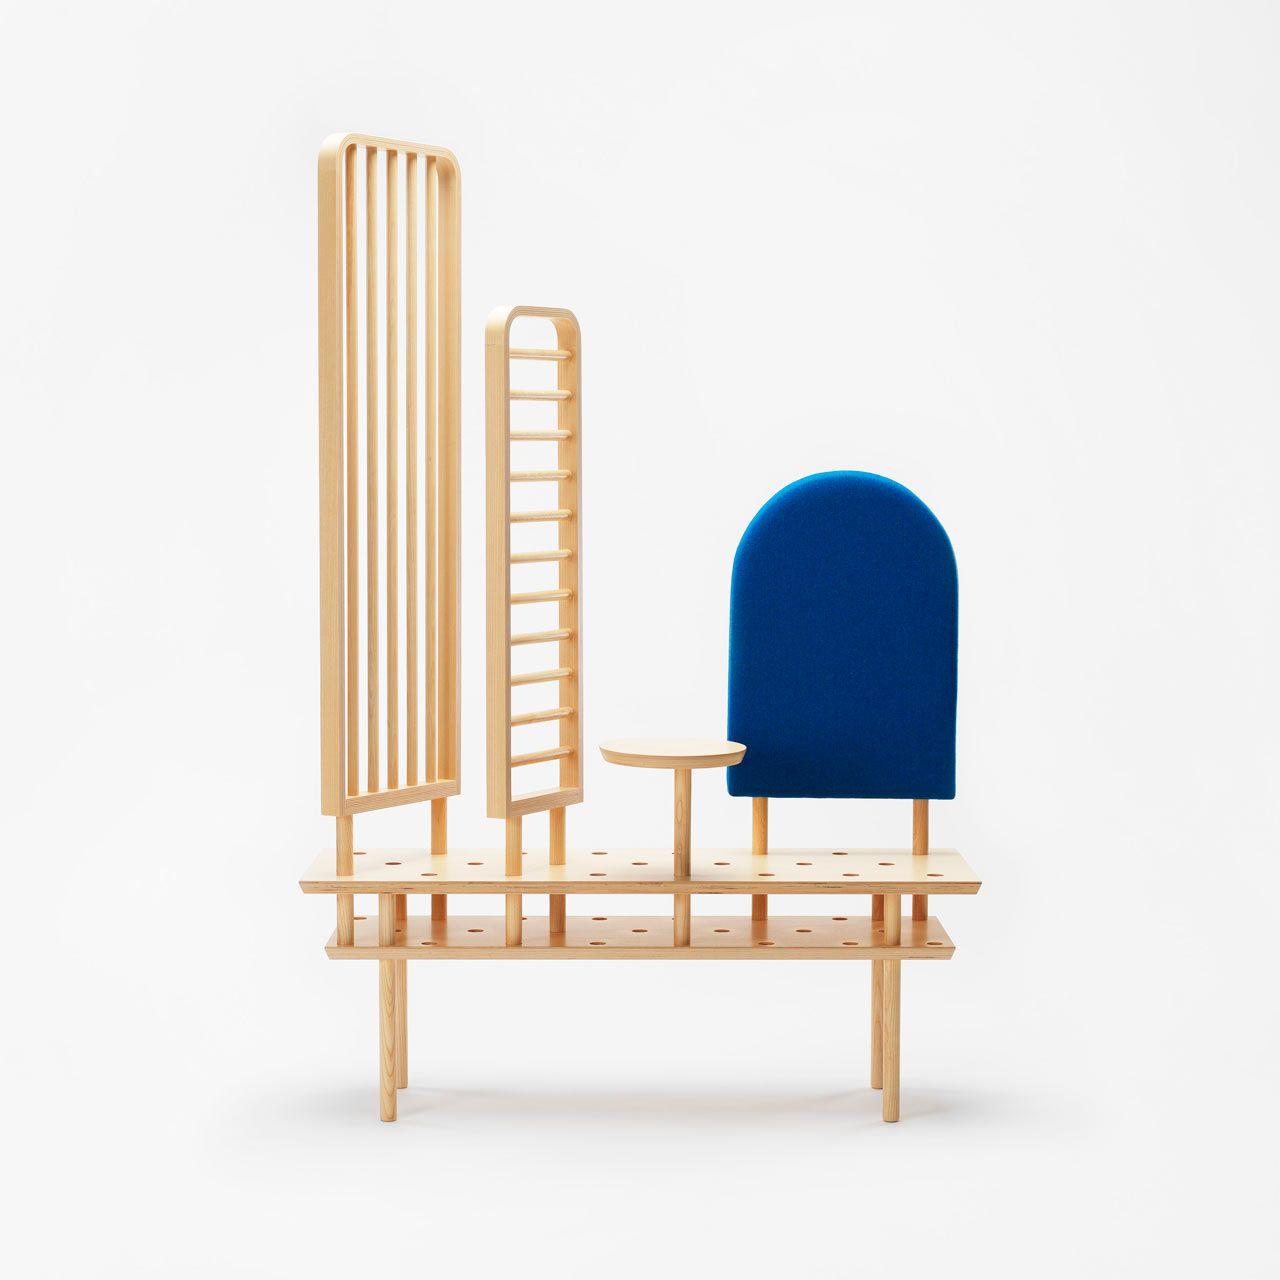 multifunctional furniture. Etta: Multifunctional Furniture For Indoor Plants - Design Milk R